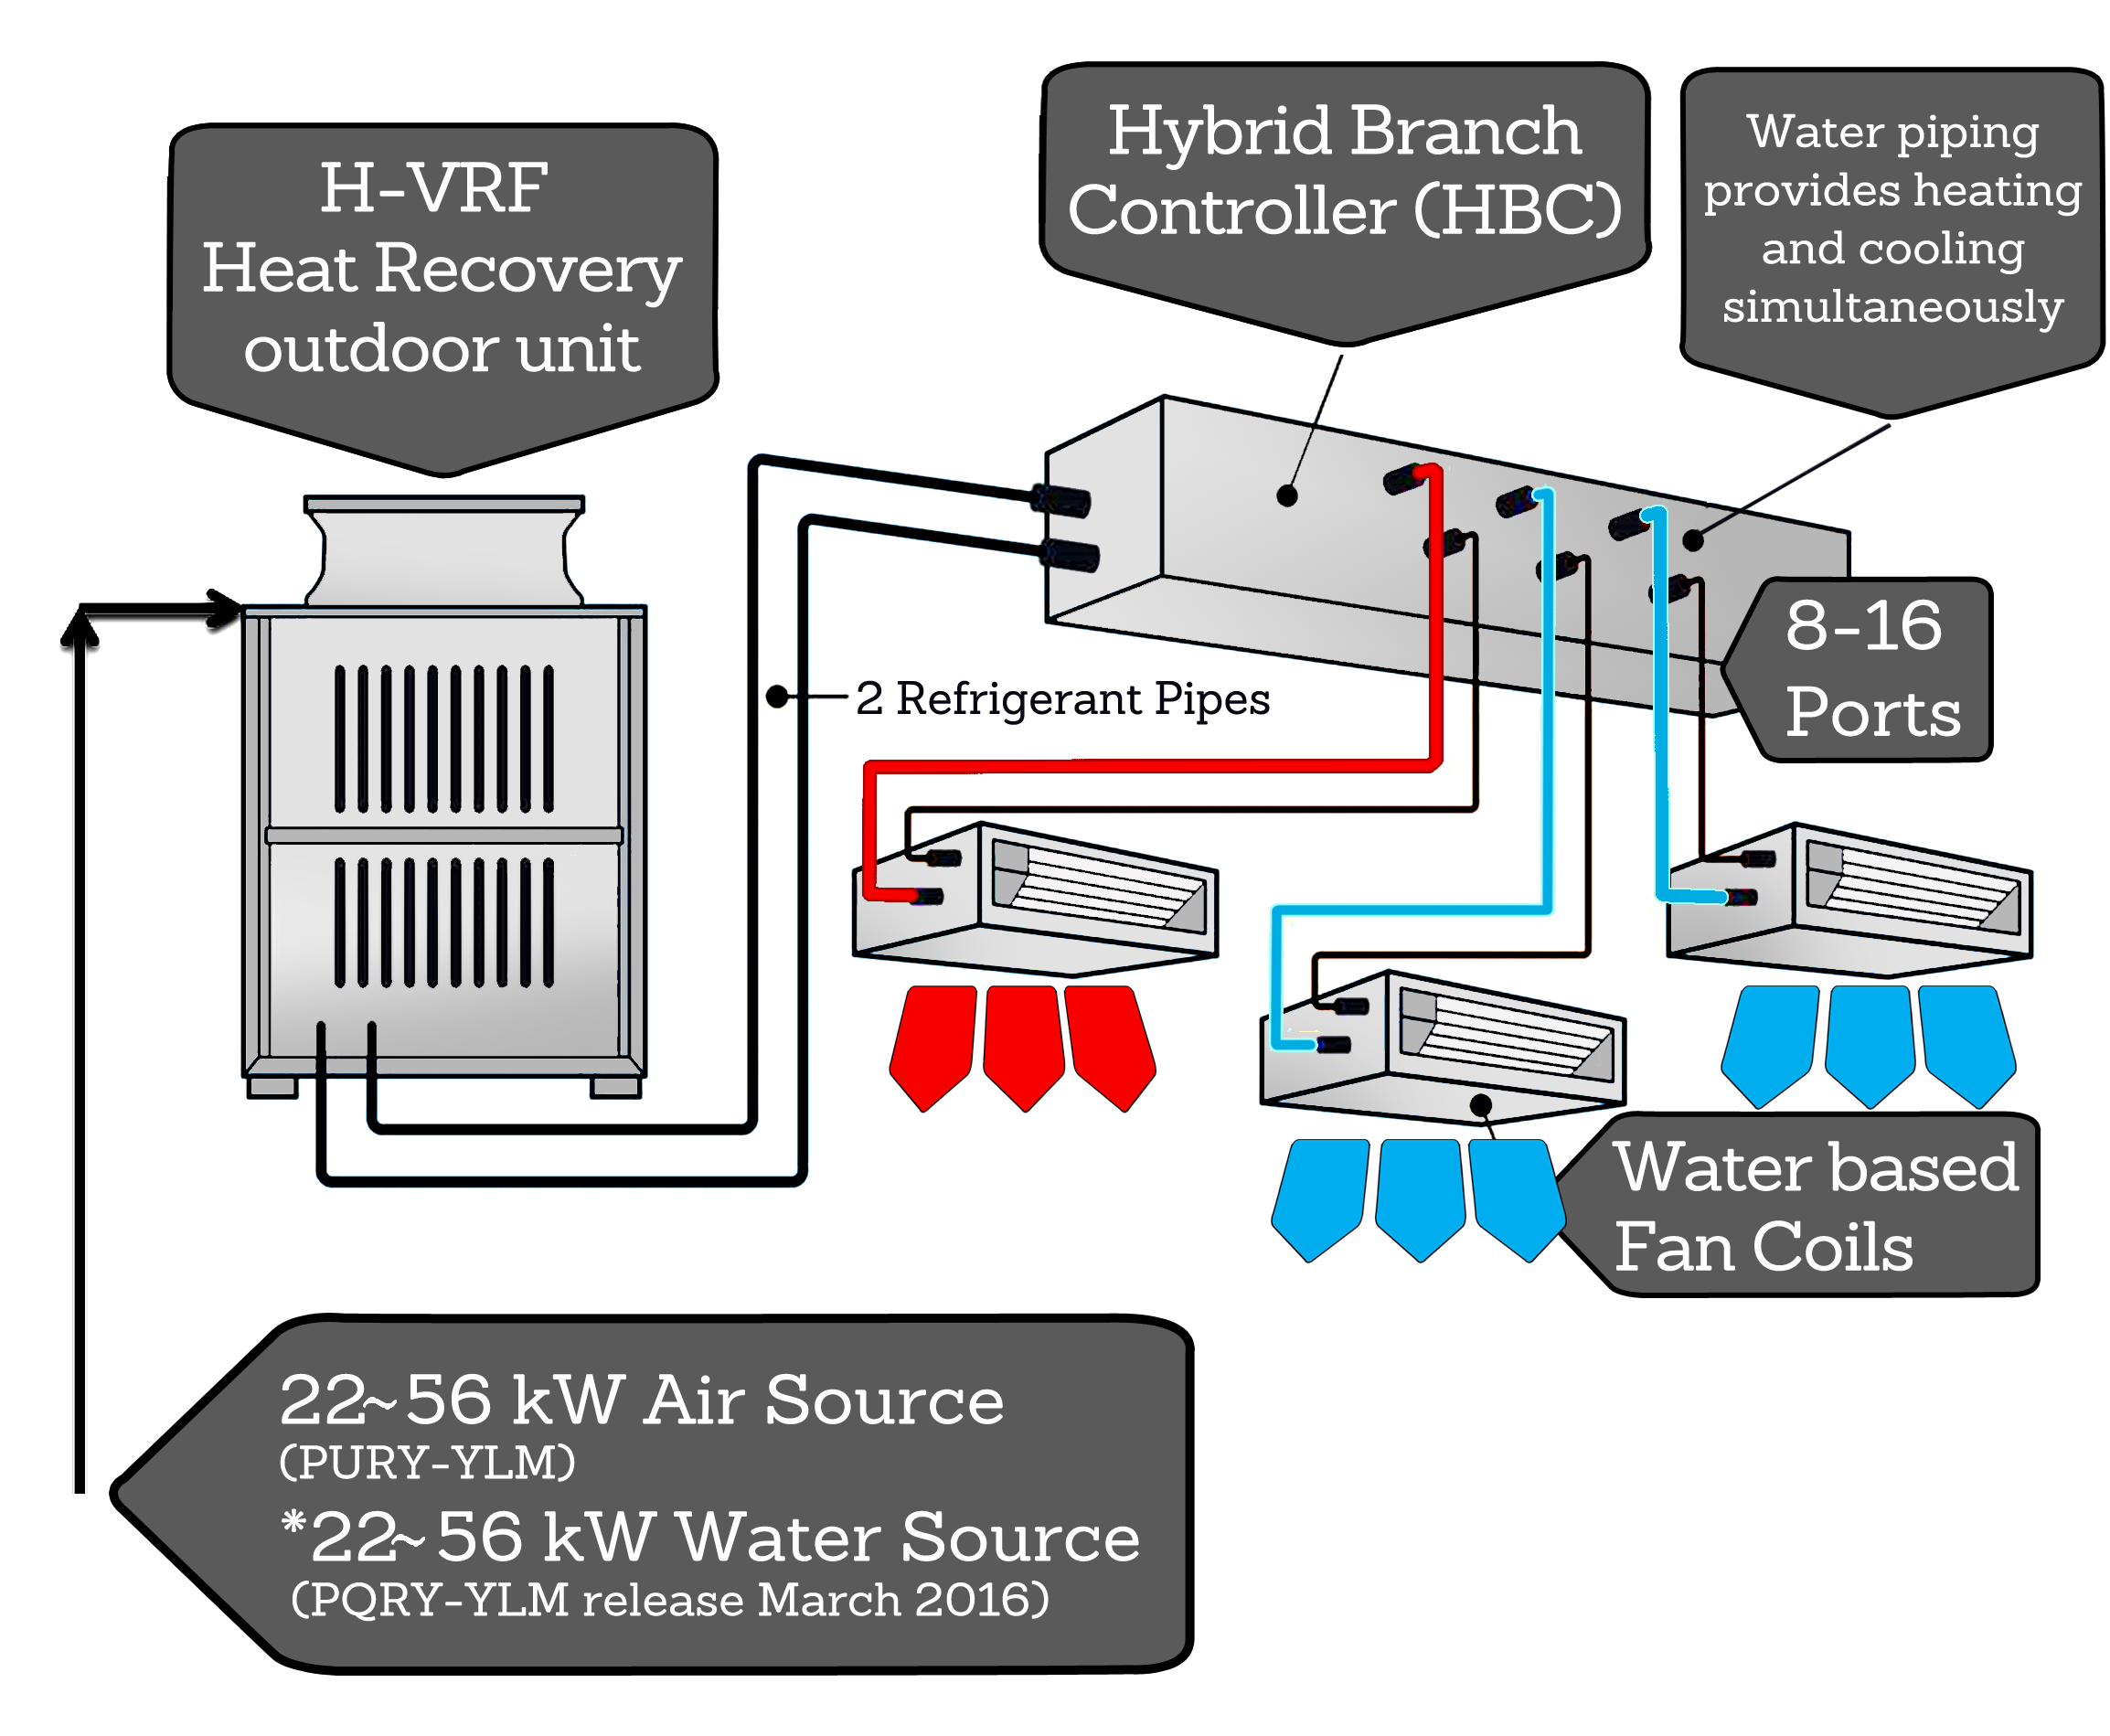 Vrf Air Conditioning Wiring Diagram - E200 Razor Scooter Wiring Diagram -  air-bag.kankubuktikan.jeanjaures37.fr | Vrf Air Conditioning Wiring Diagram |  | Wiring Diagram Resource